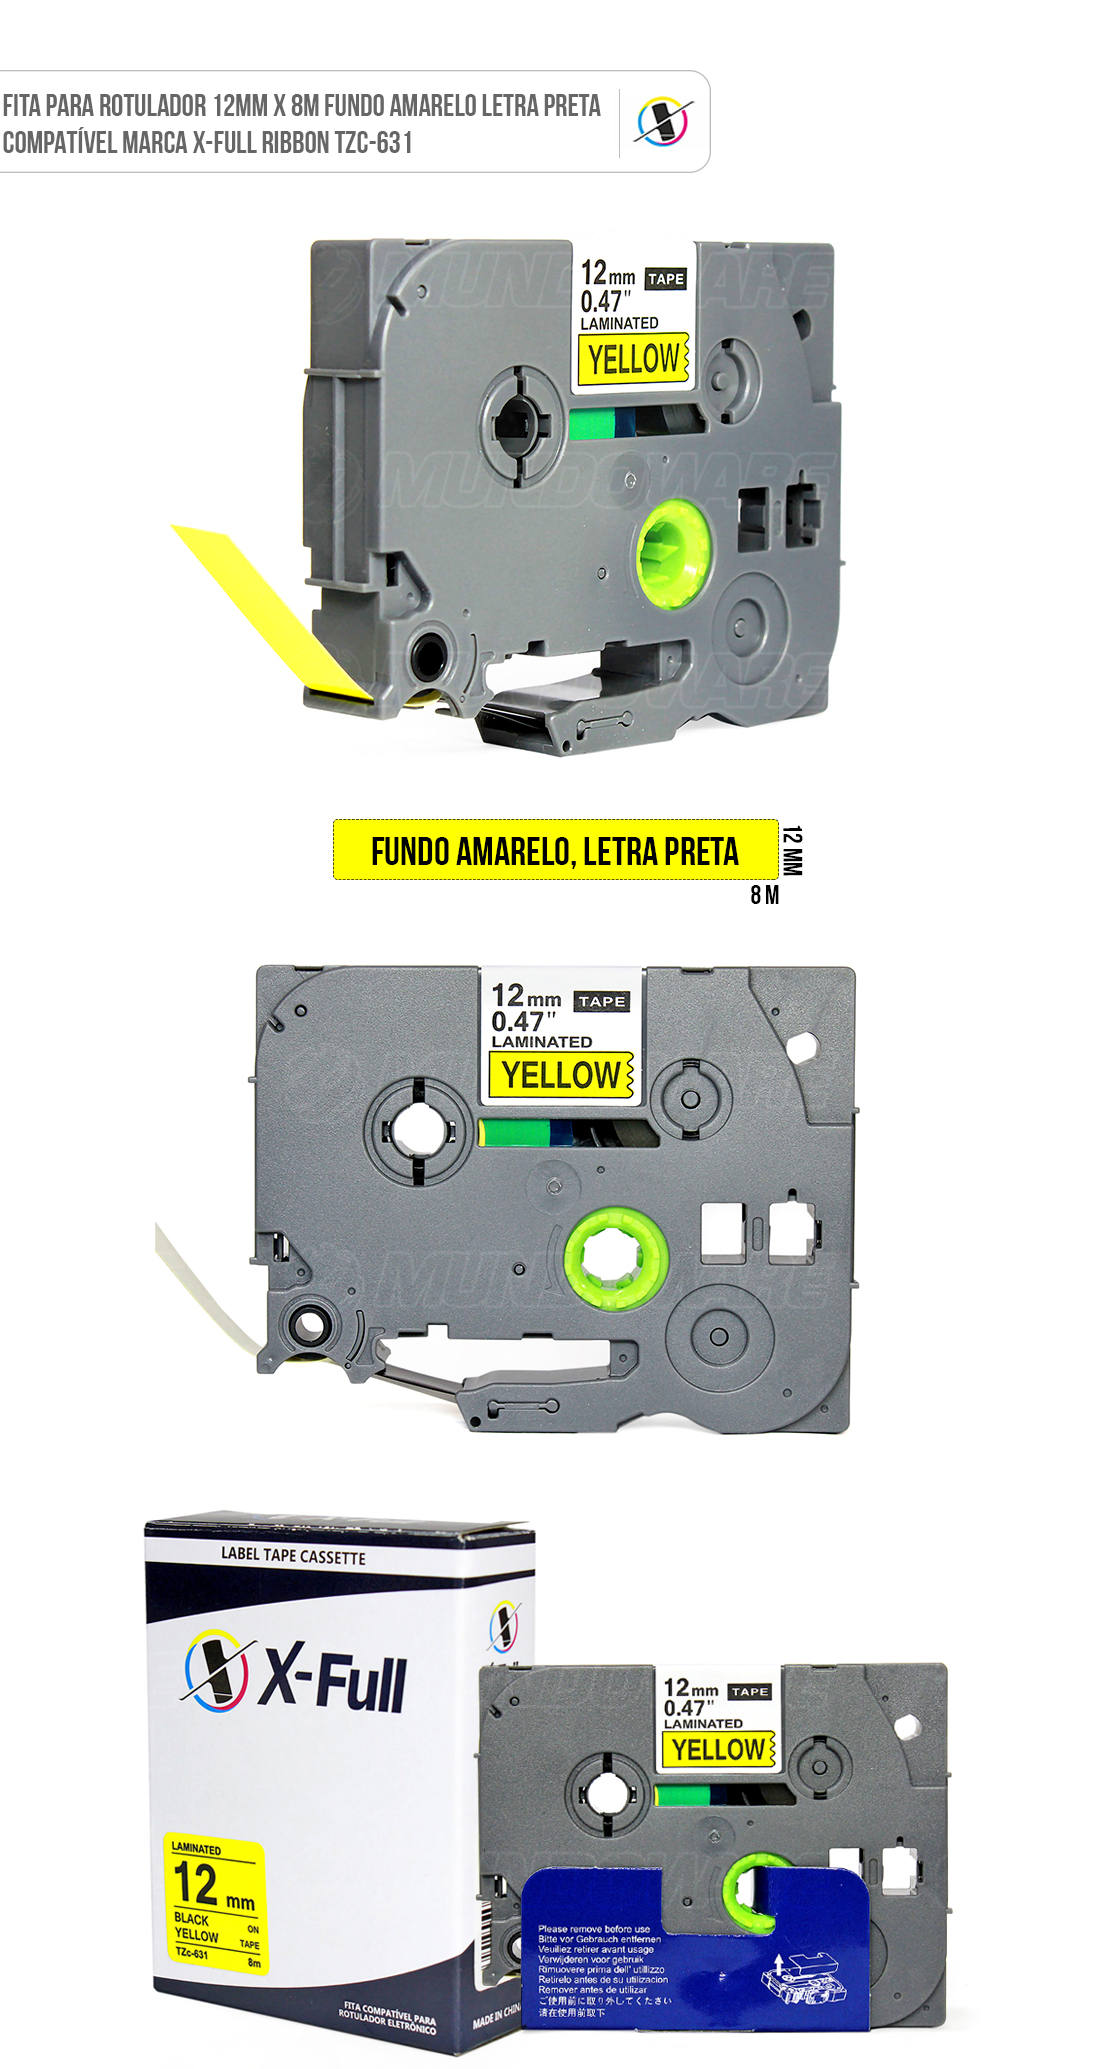 Fita Compatível para Rotulador Marca X-Full Ribbon Referência TZc-631 TZe-631 TZ-631 12mm x 8m Amarelo/Preto para Brother